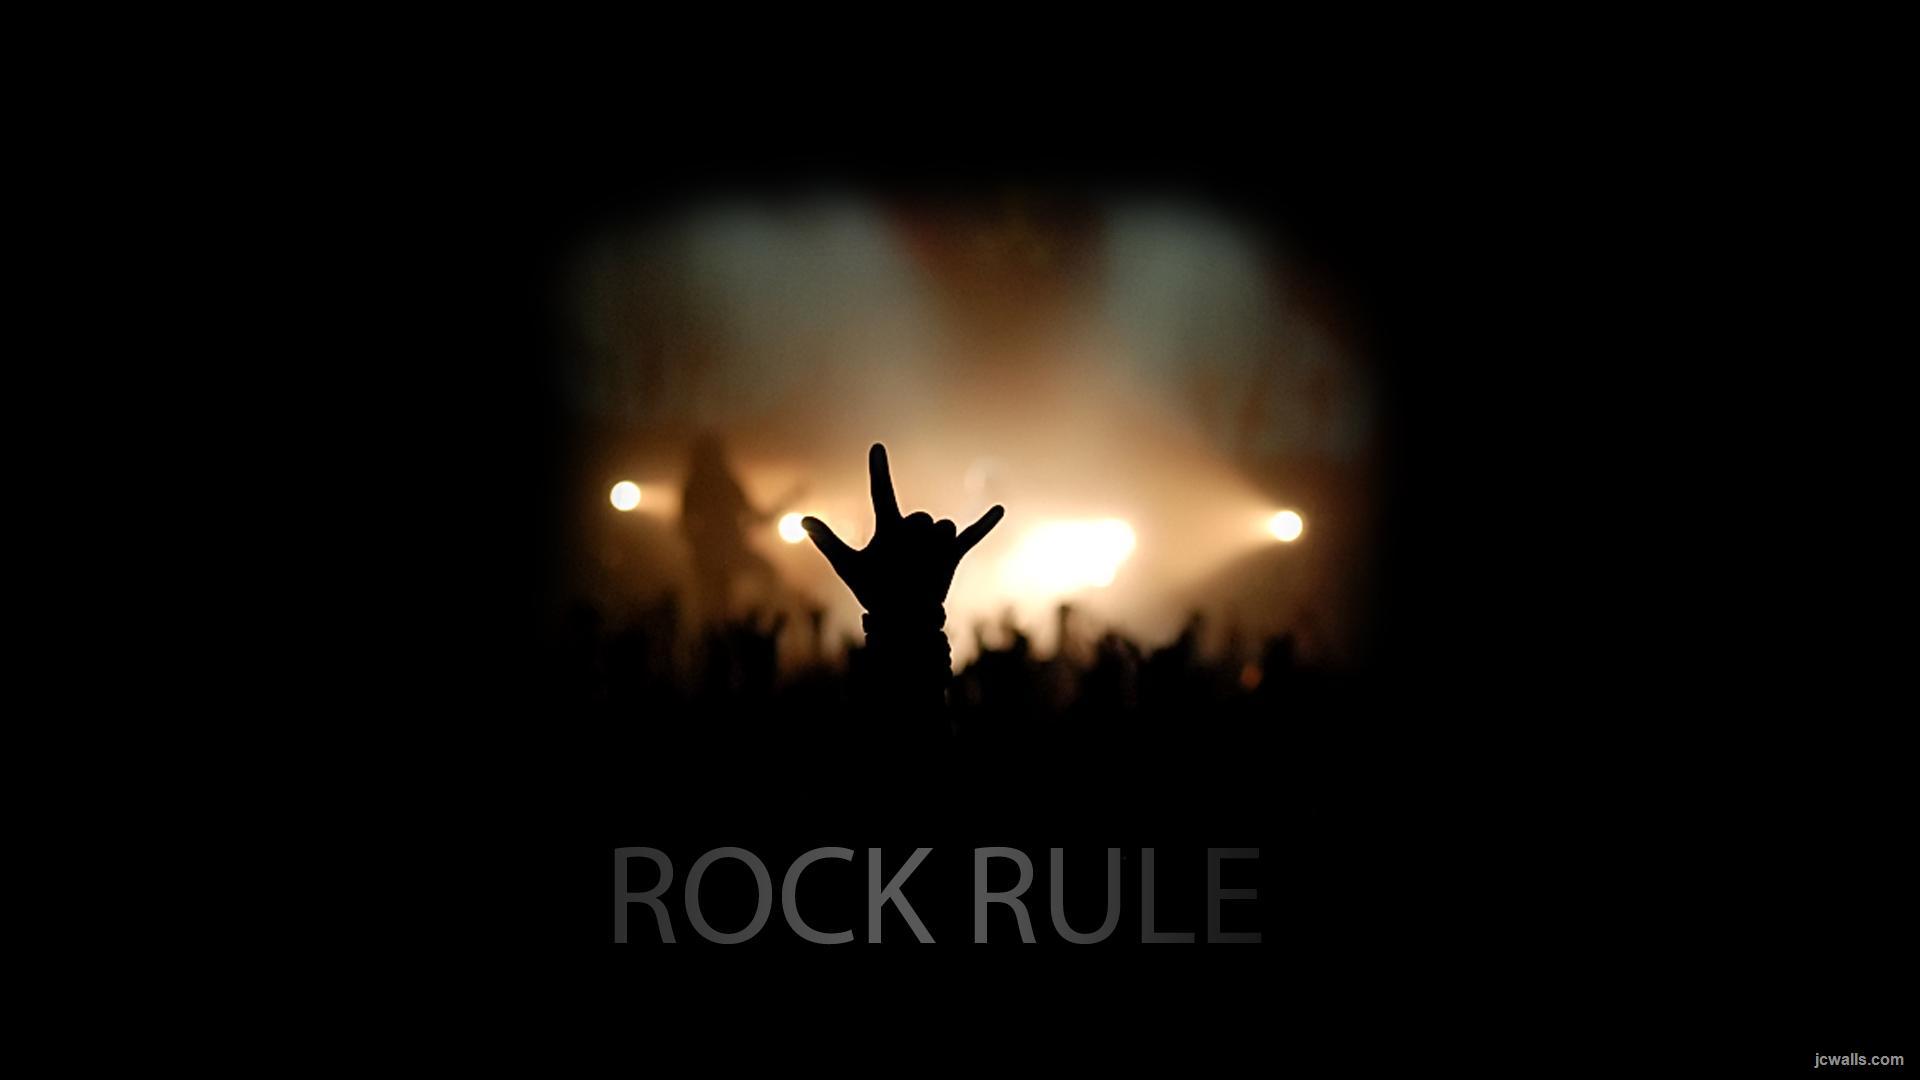 Beautiful Wallpaper Music Cell Phone - Rocking-Wallpapers-019  Image_587574.jpg